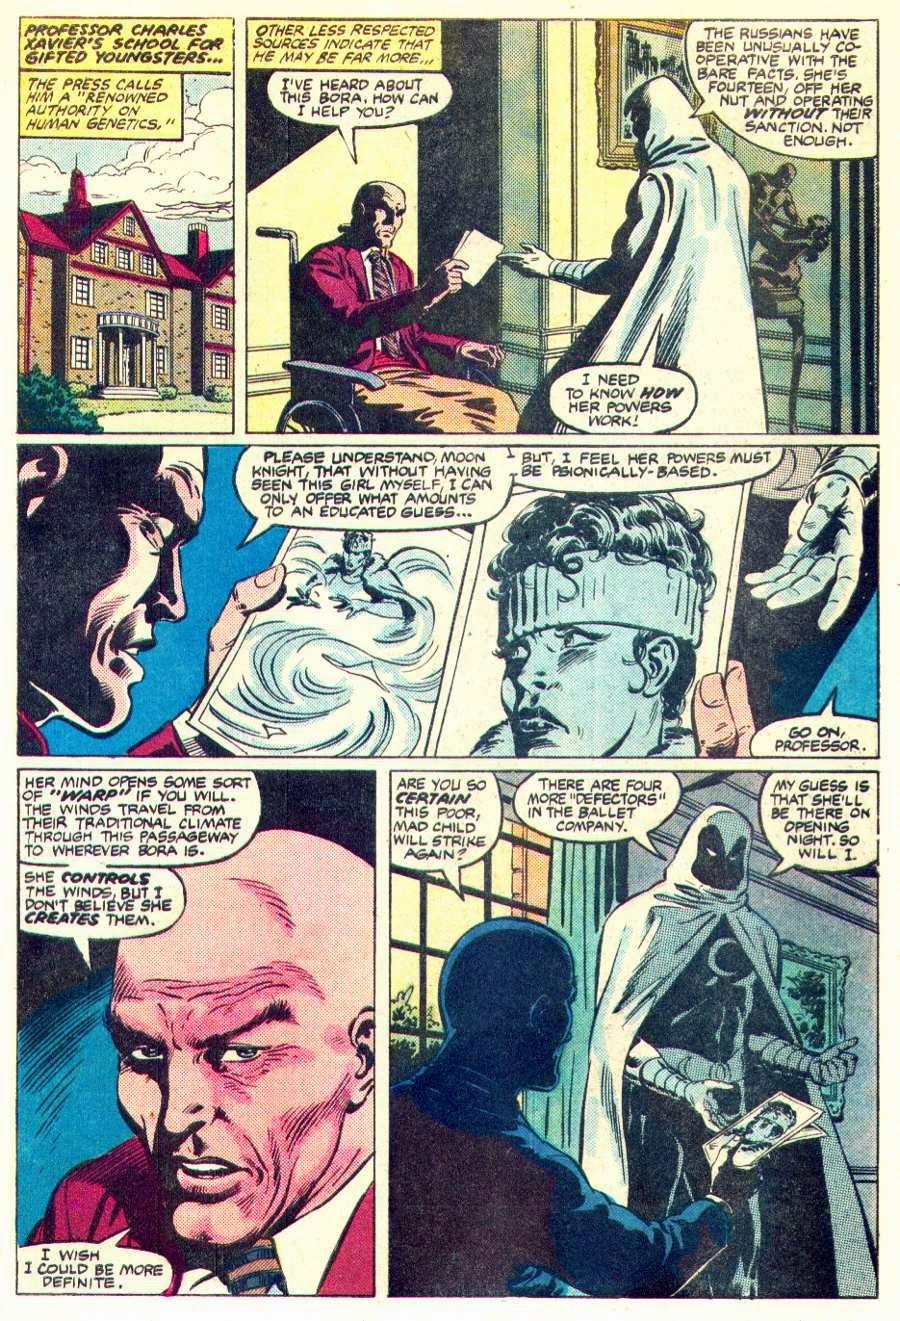 Moon Knight v1 035 (1984) …………………… | Viewcomic reading